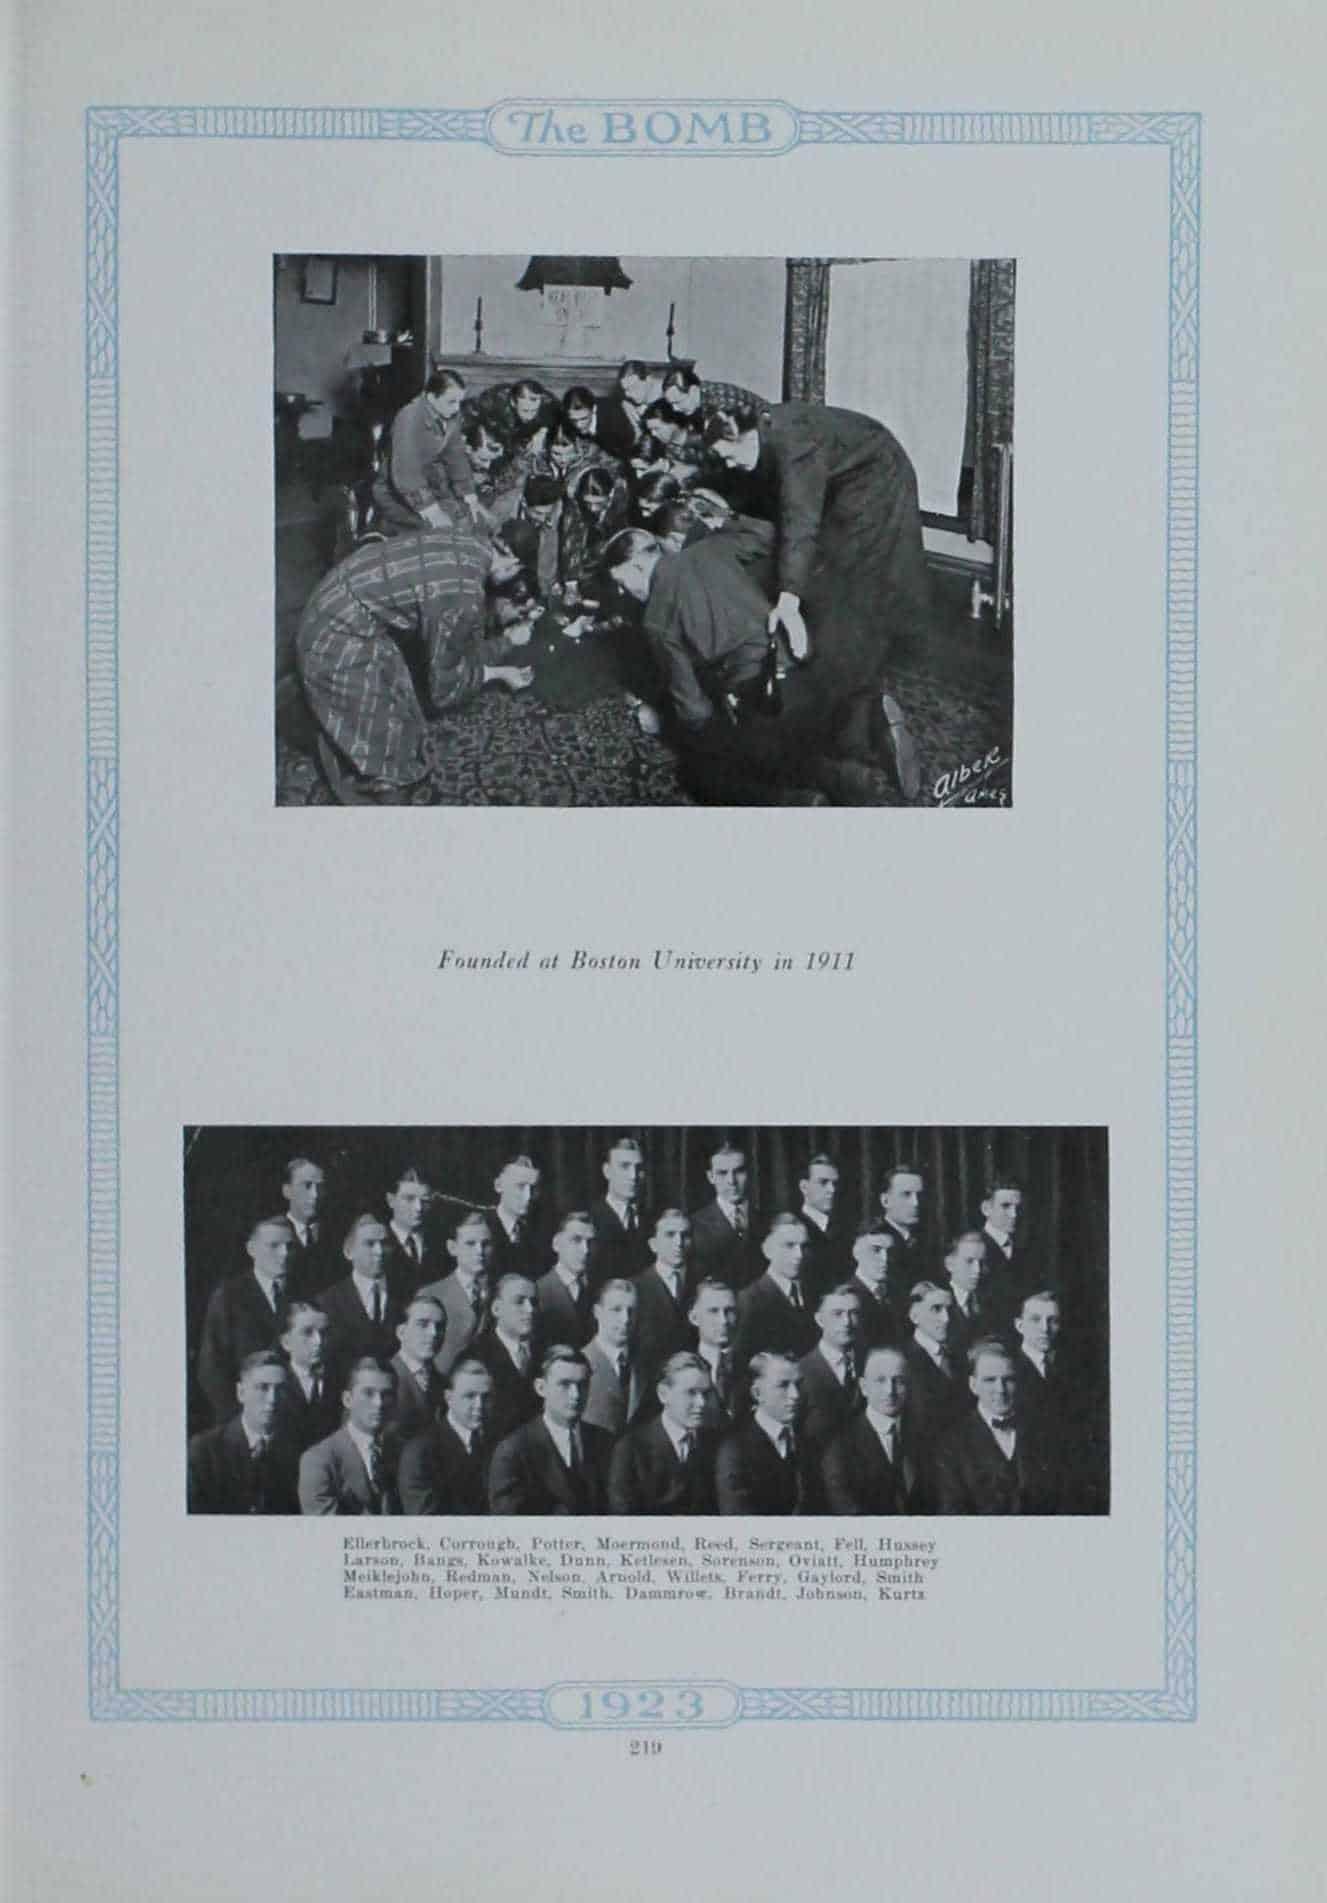 1922 Lambda Chi Alpha